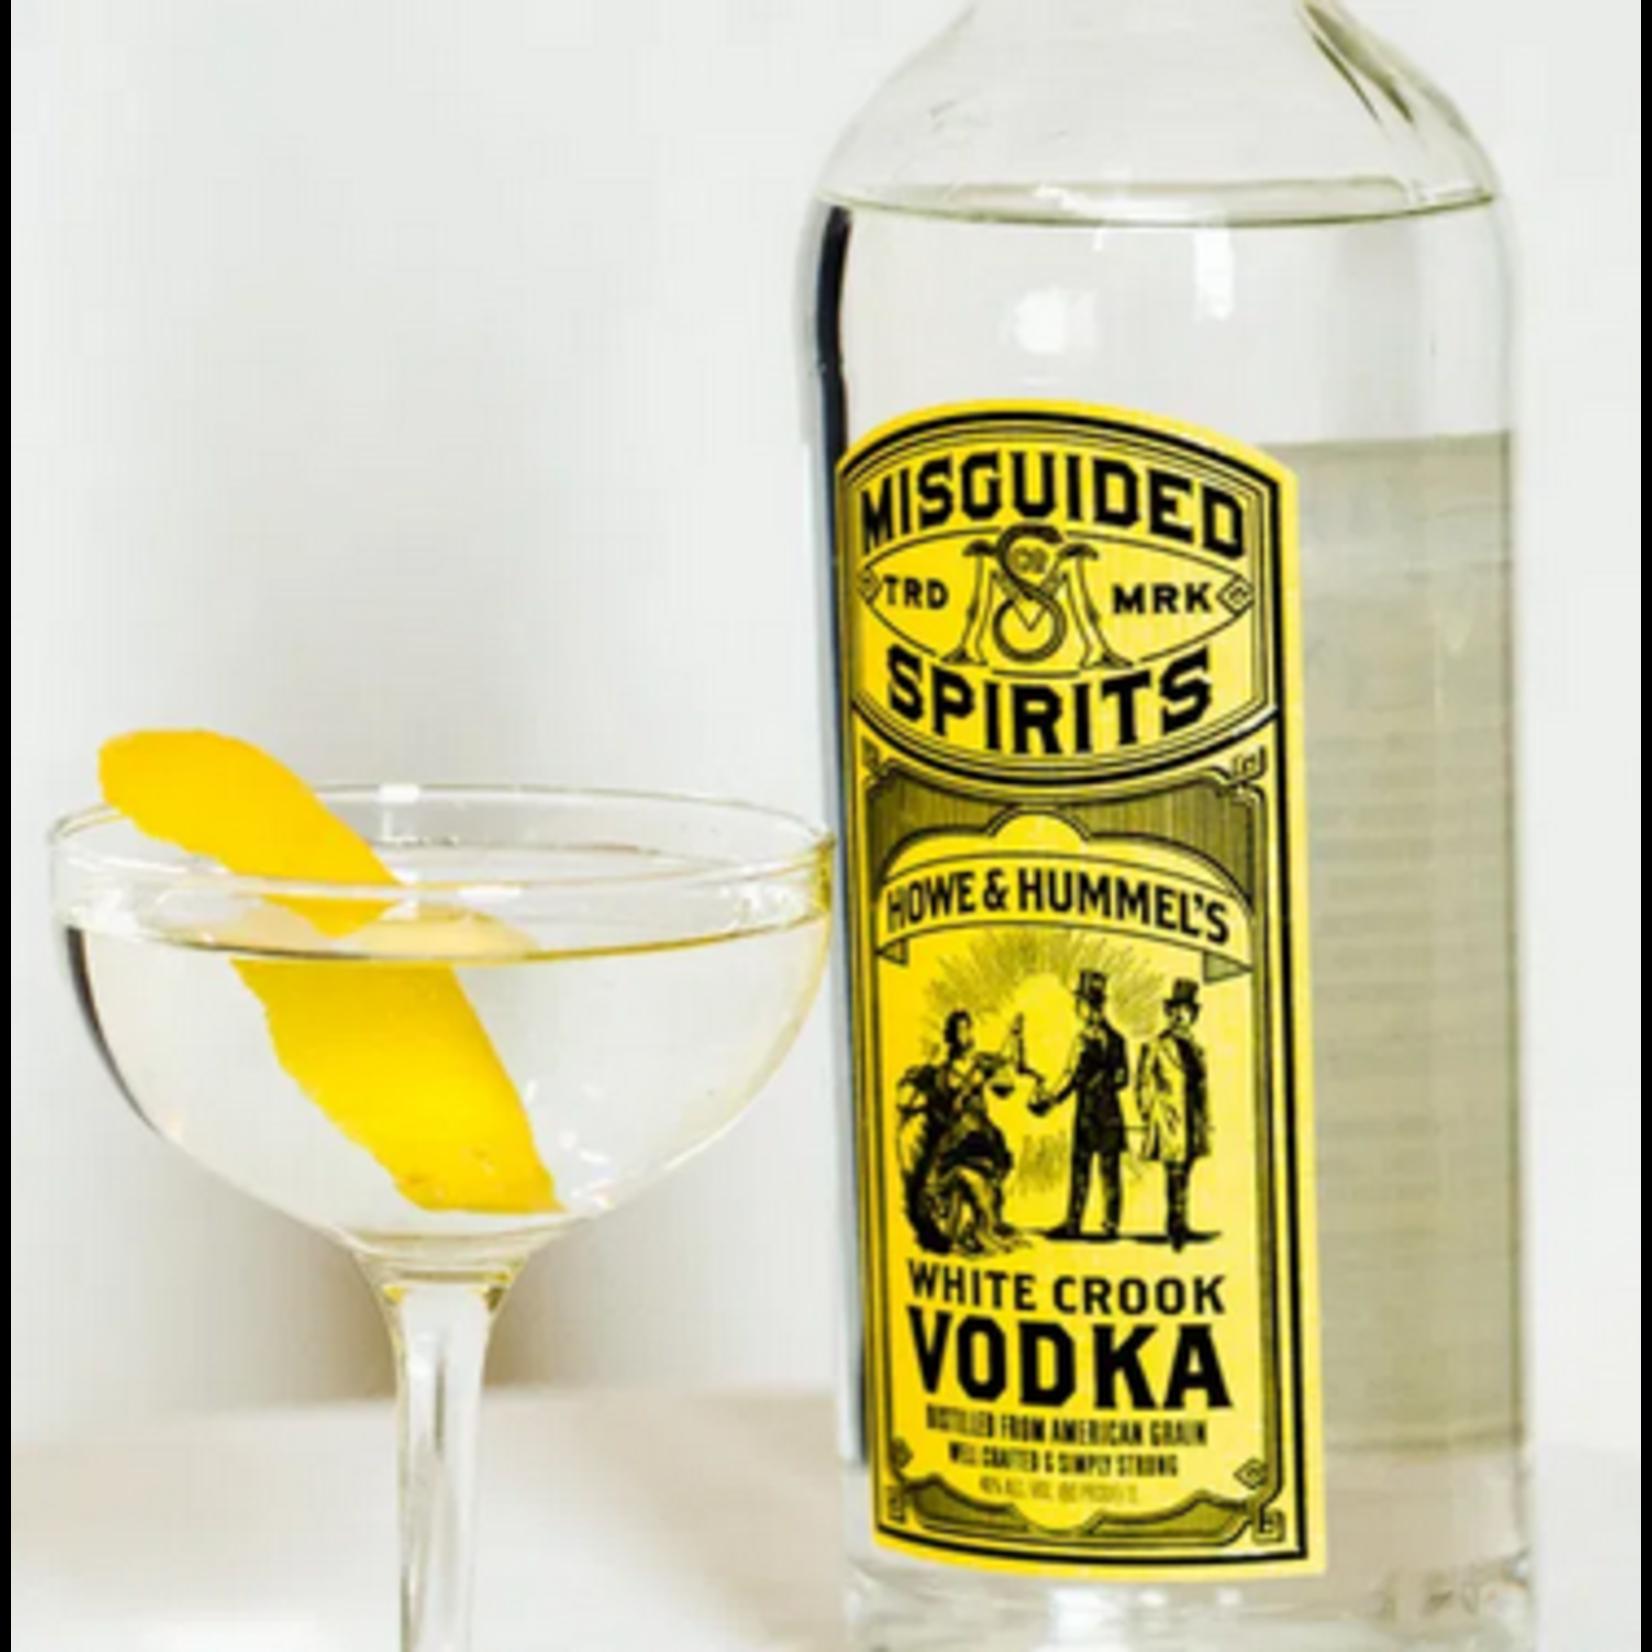 Spirits Misguided Spirits Howe and Hummel White Crook Vodka 1L